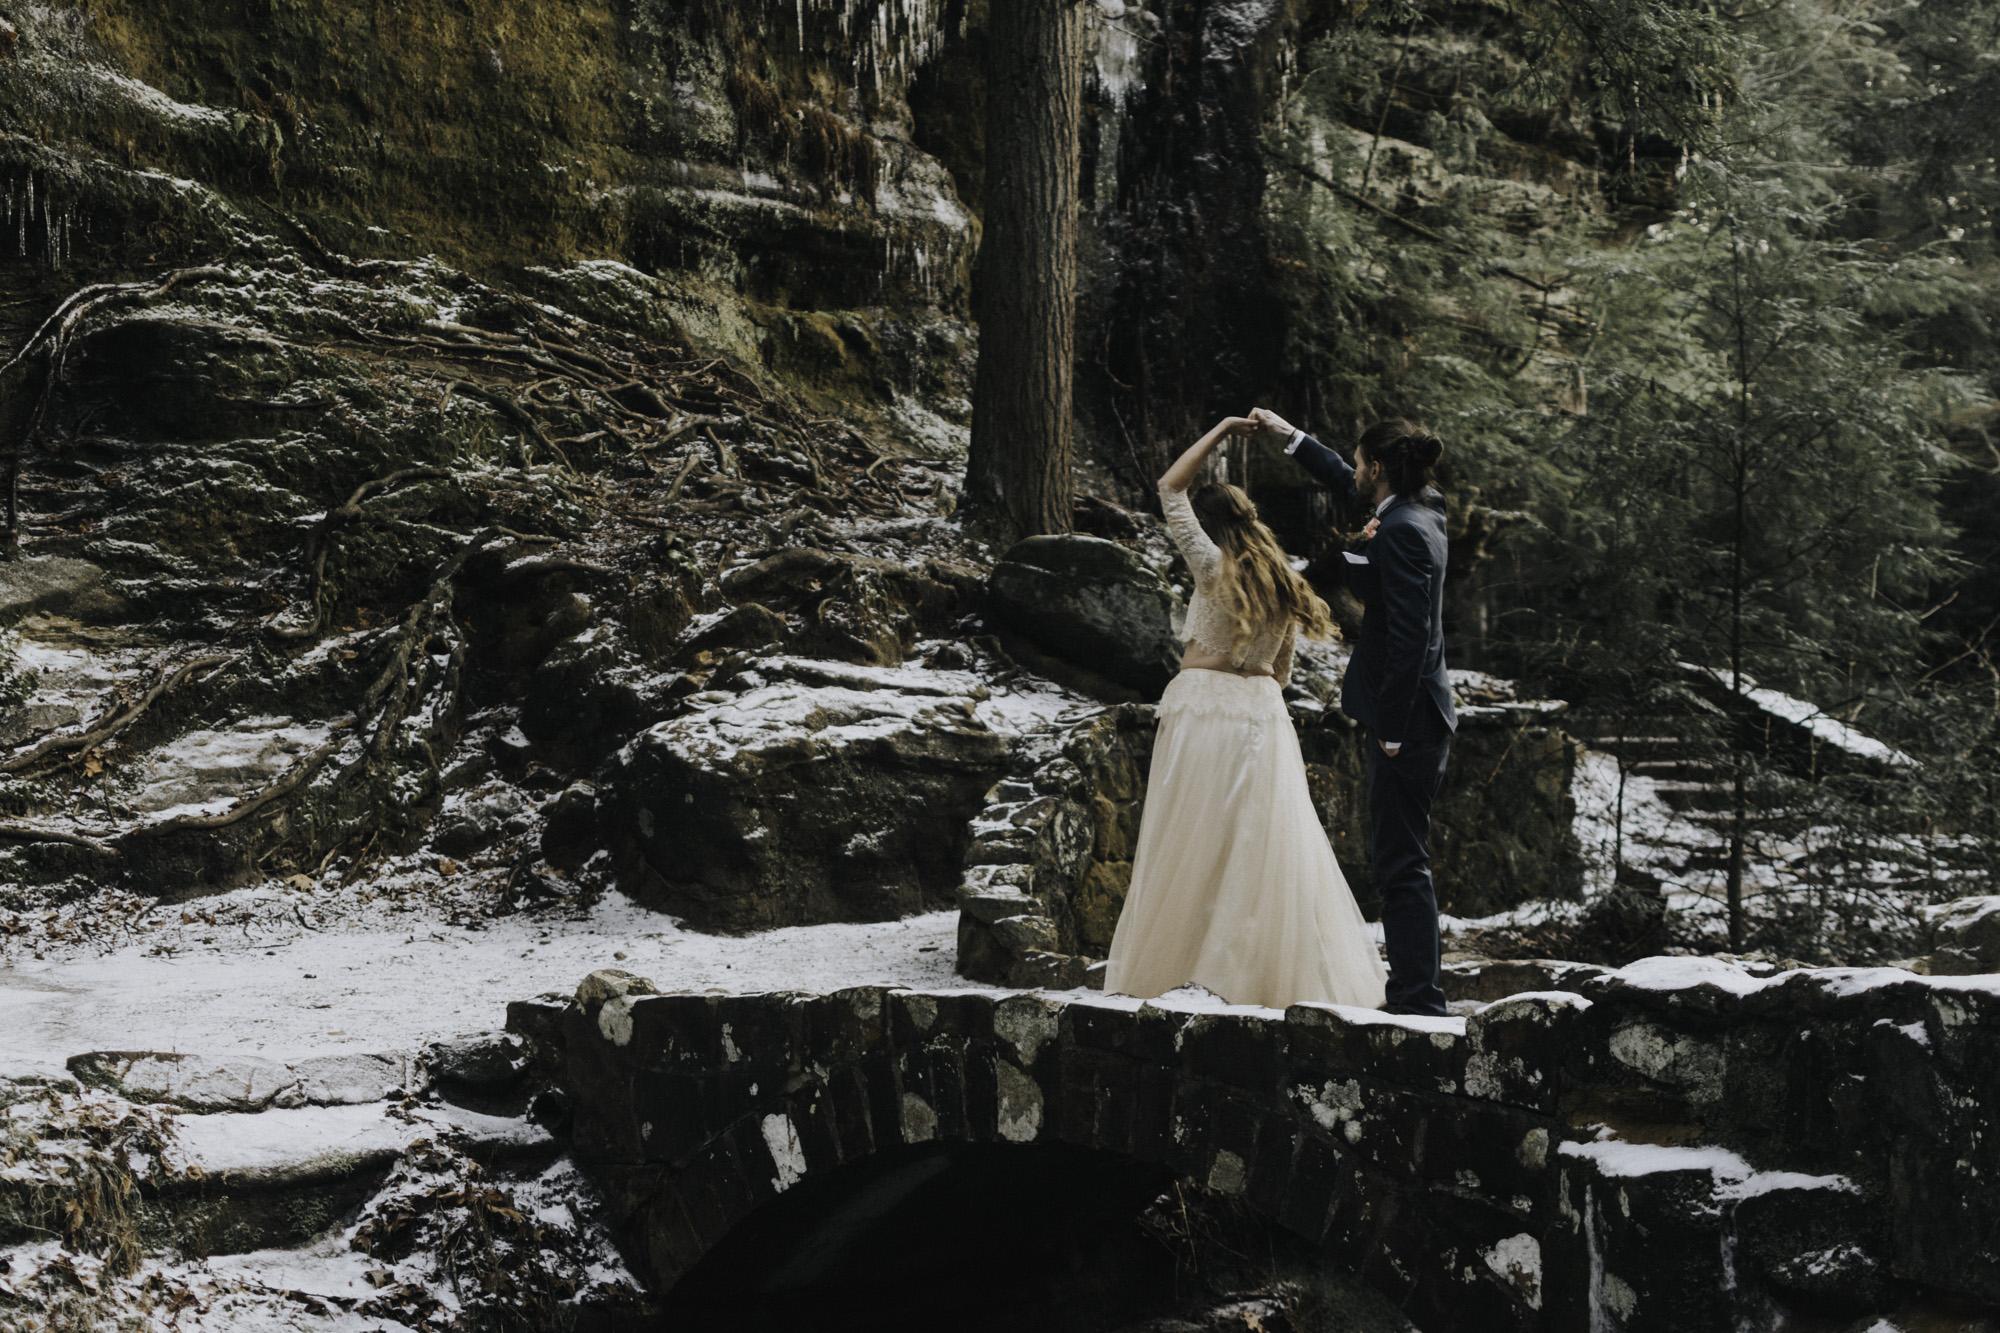 Cate_Ann_Photography_Dayton_Ohio_Wedding_Elopement_And_Engagement_PhotographerDSC_6147.jpg